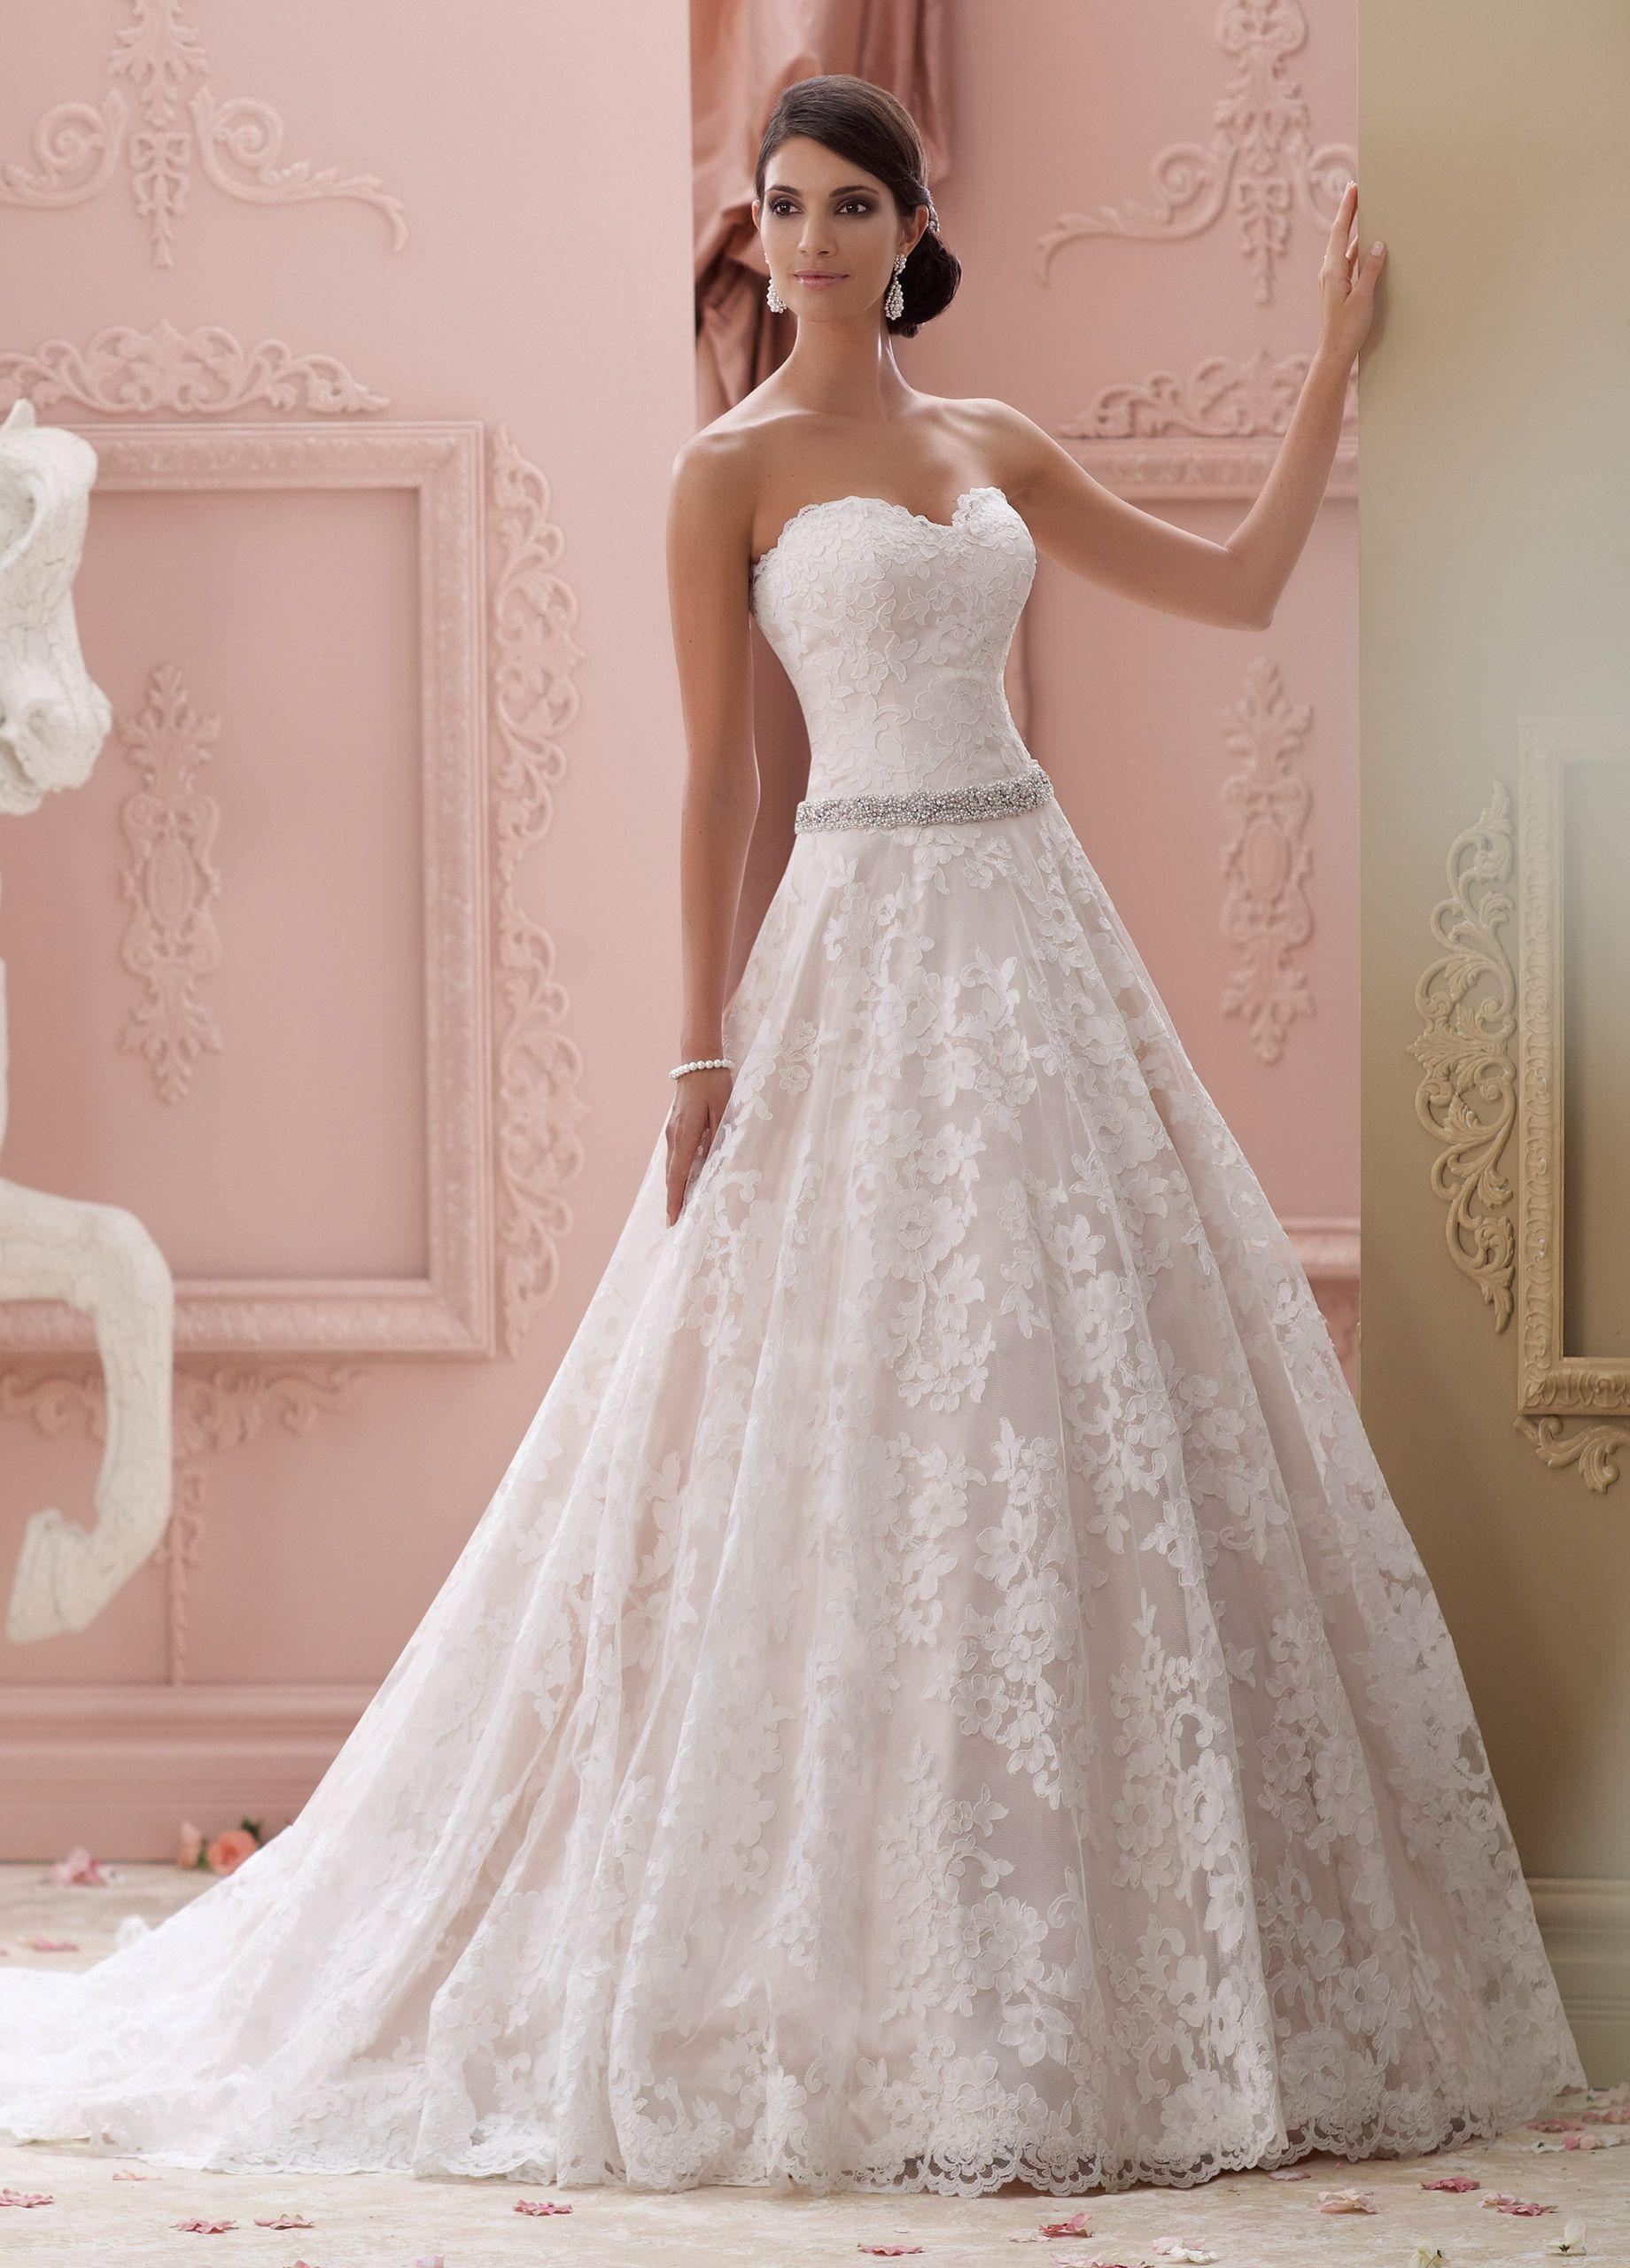 Strapless Lace & Jeweled-Belt Ball Gown Wedding Dress- 115226 Suri ...